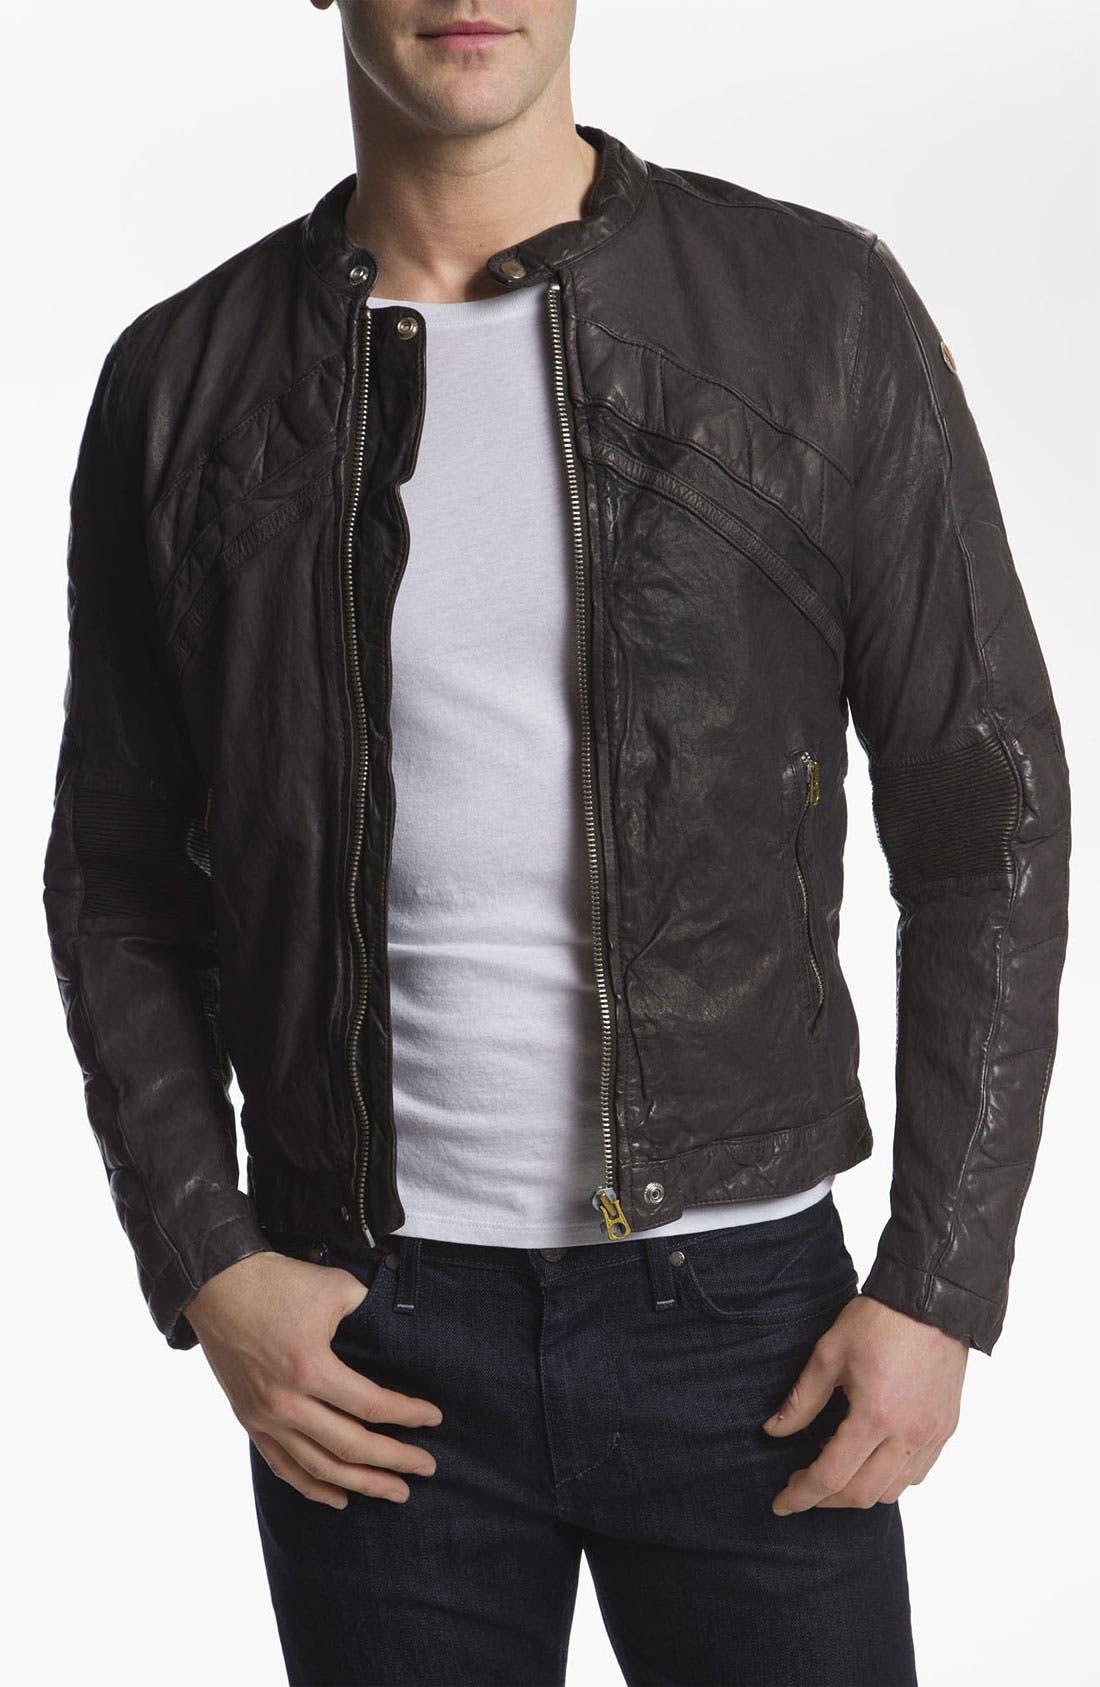 Alternate Image 1 Selected - DIESEL® 'Lumi' Leather Jacket